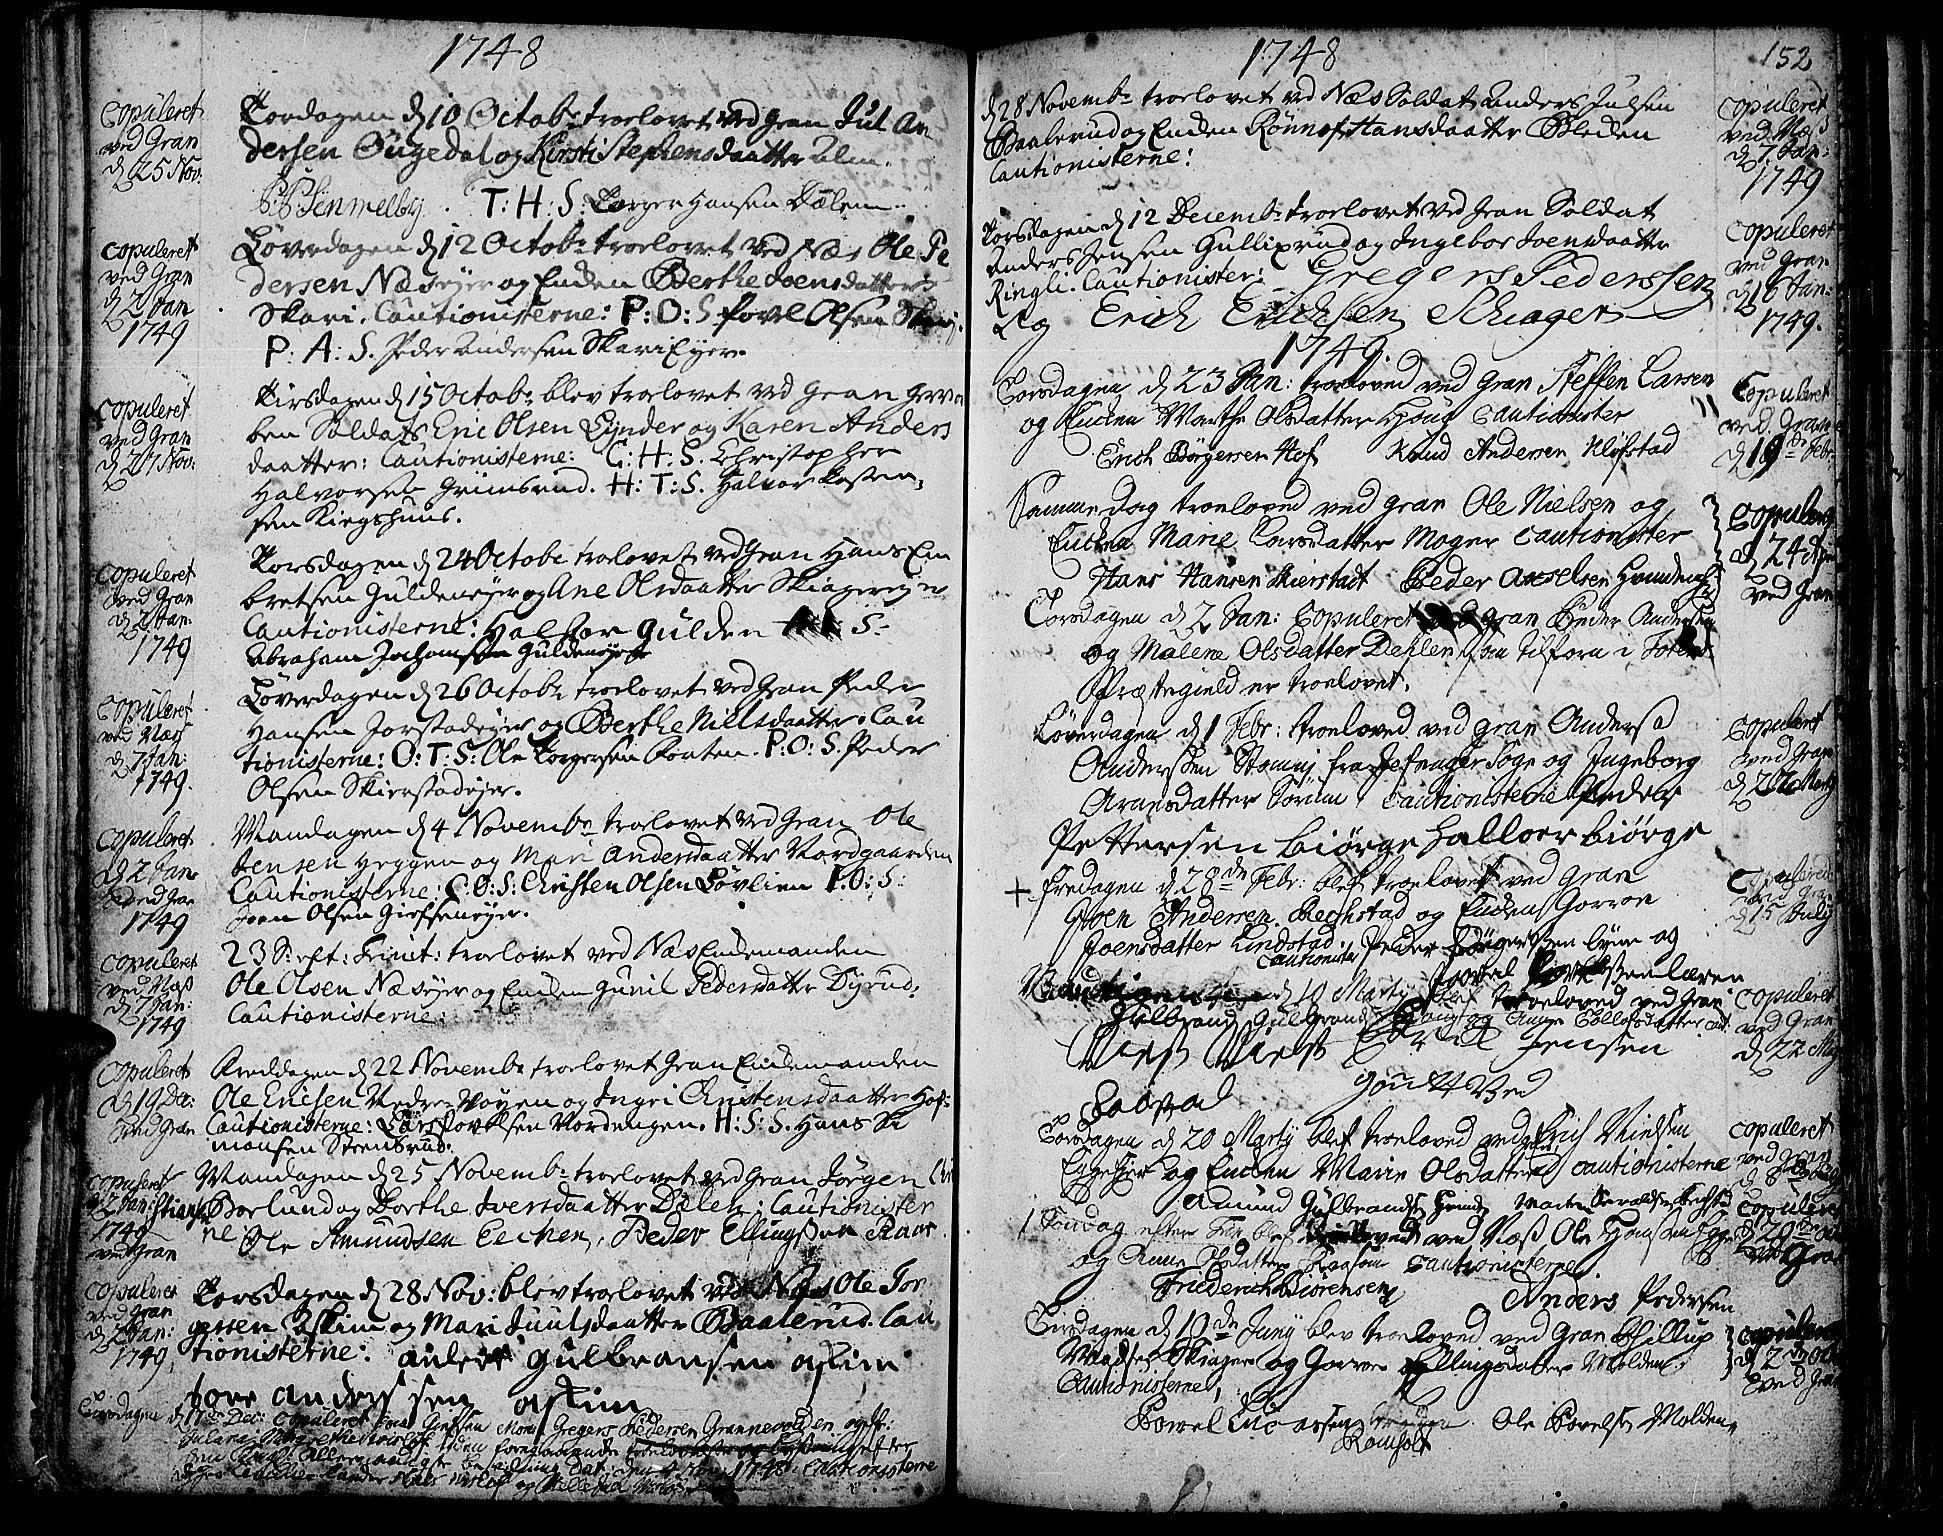 SAH, Gran prestekontor, Ministerialbok nr. 3, 1745-1758, s. 152